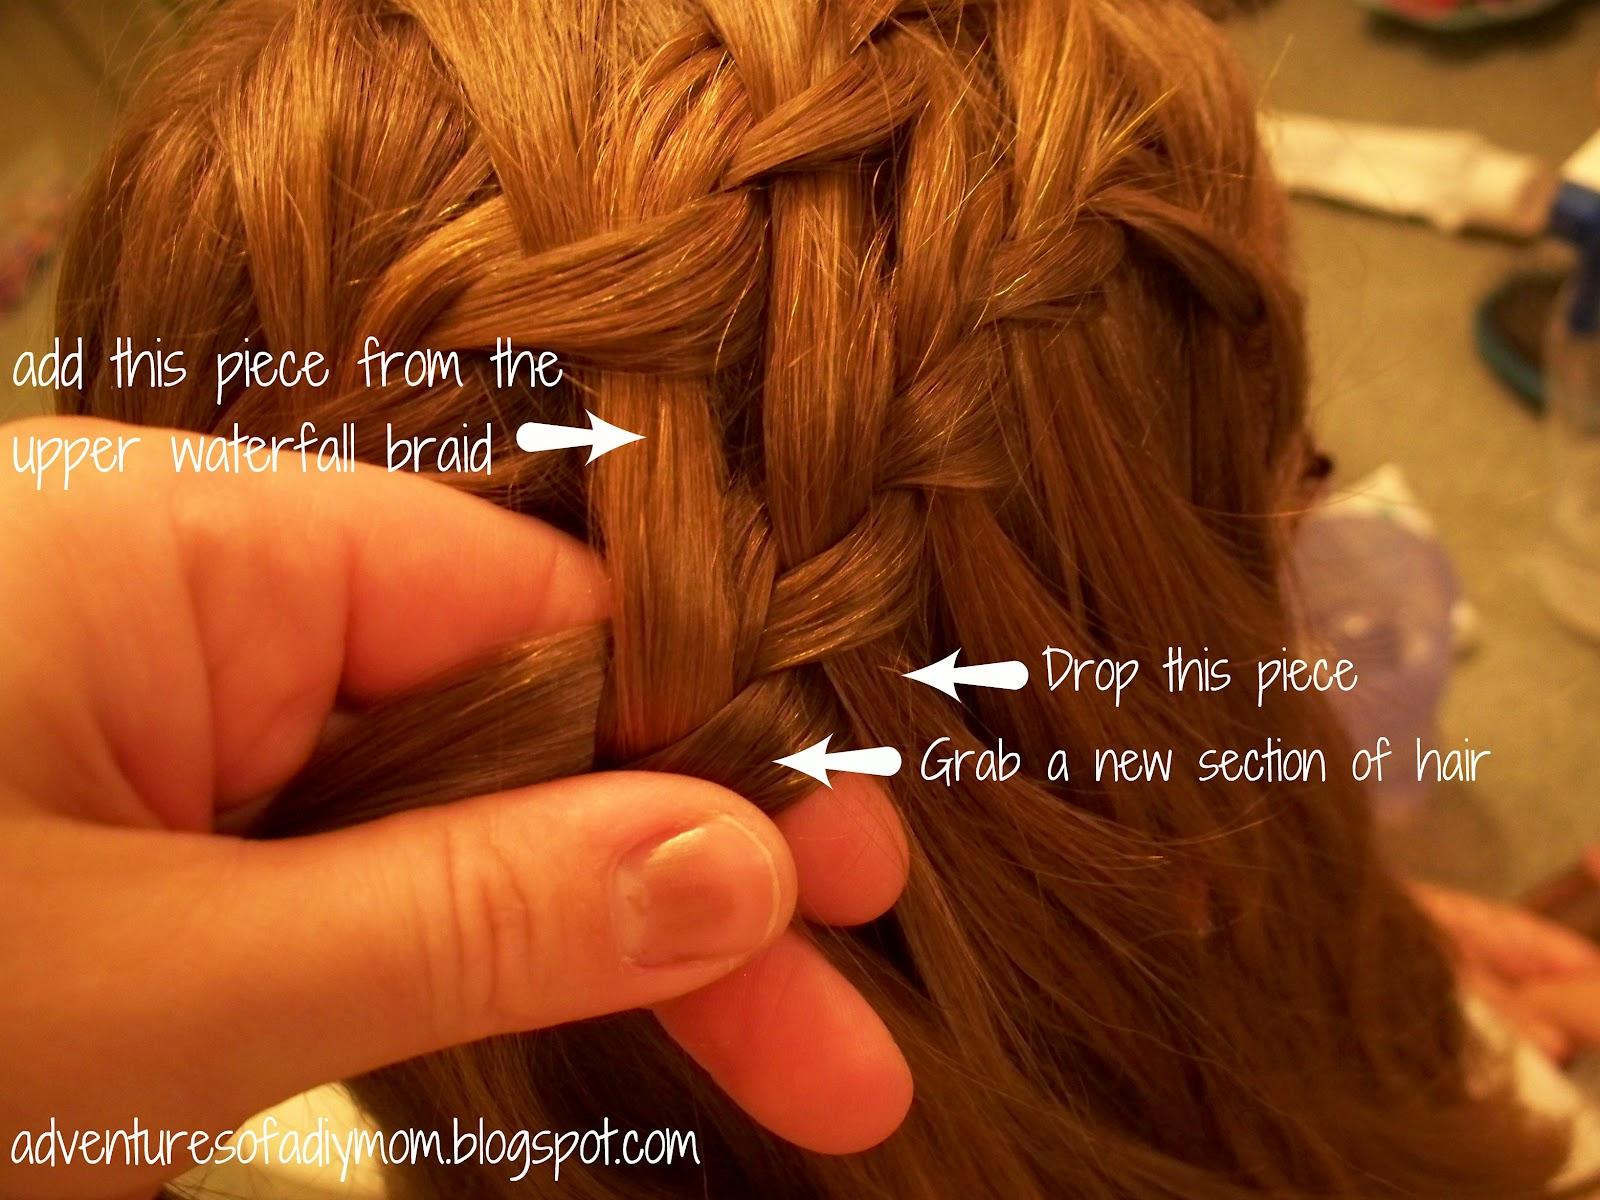 Mini Hair Series Double Waterfall Braid Adventures Of A Diy Mom